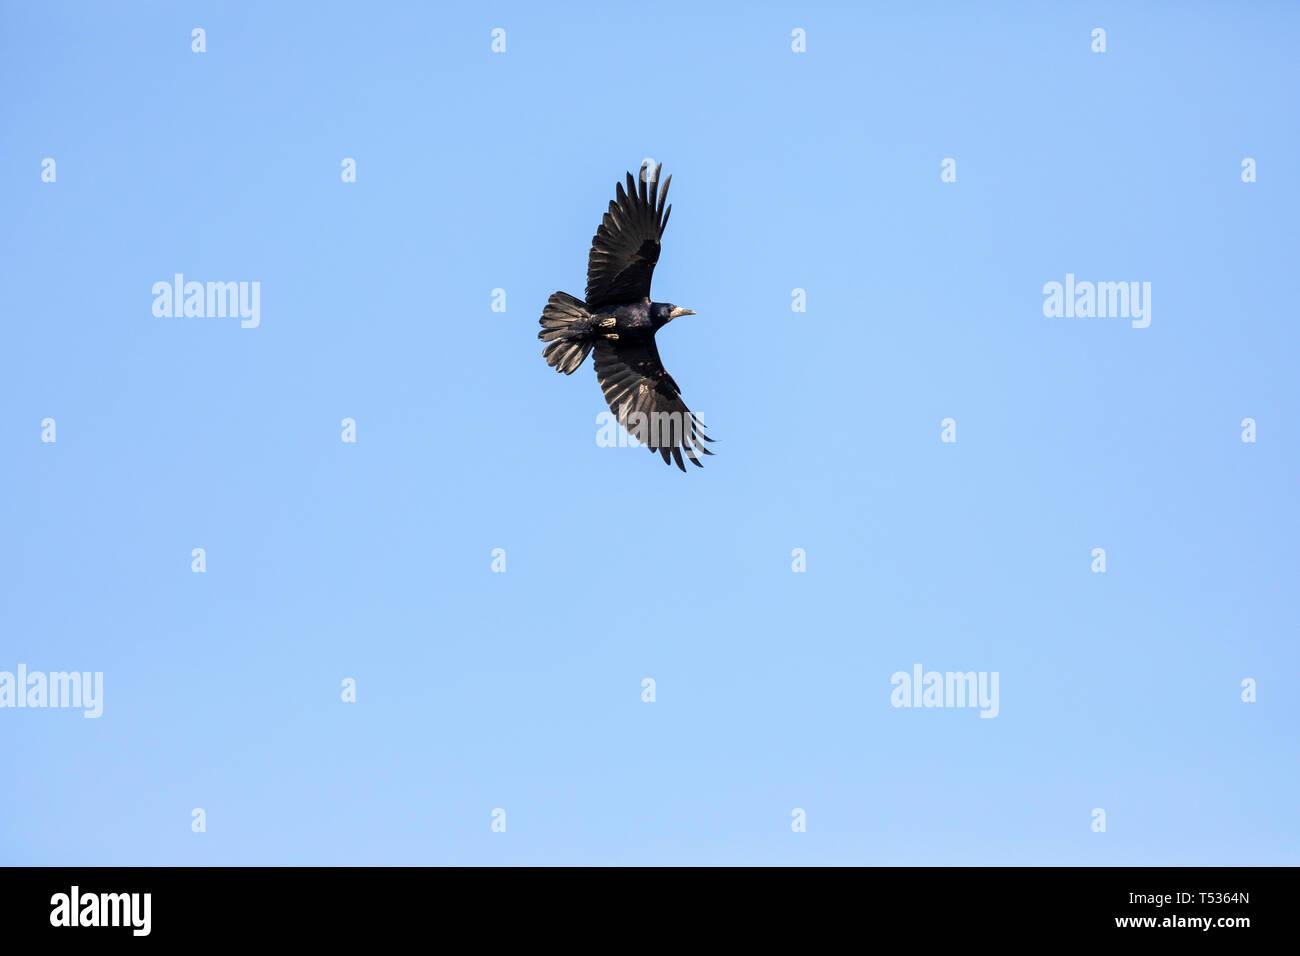 Black Raven Flying in a Blue Sky. - Stock Image